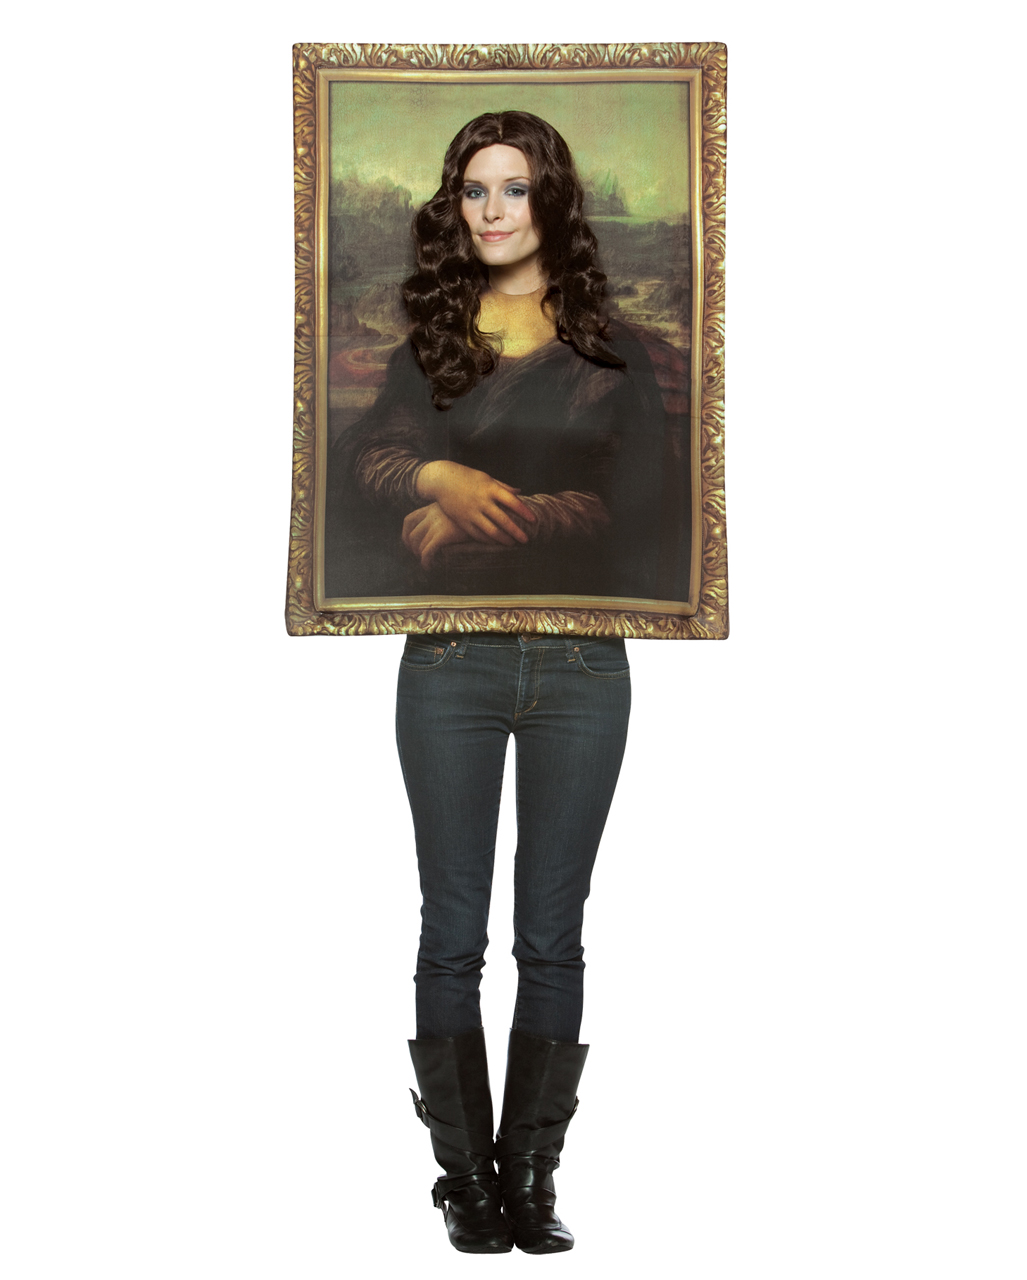 Mona Lisa Faschingskostum Online Bestellen Karneval Universe